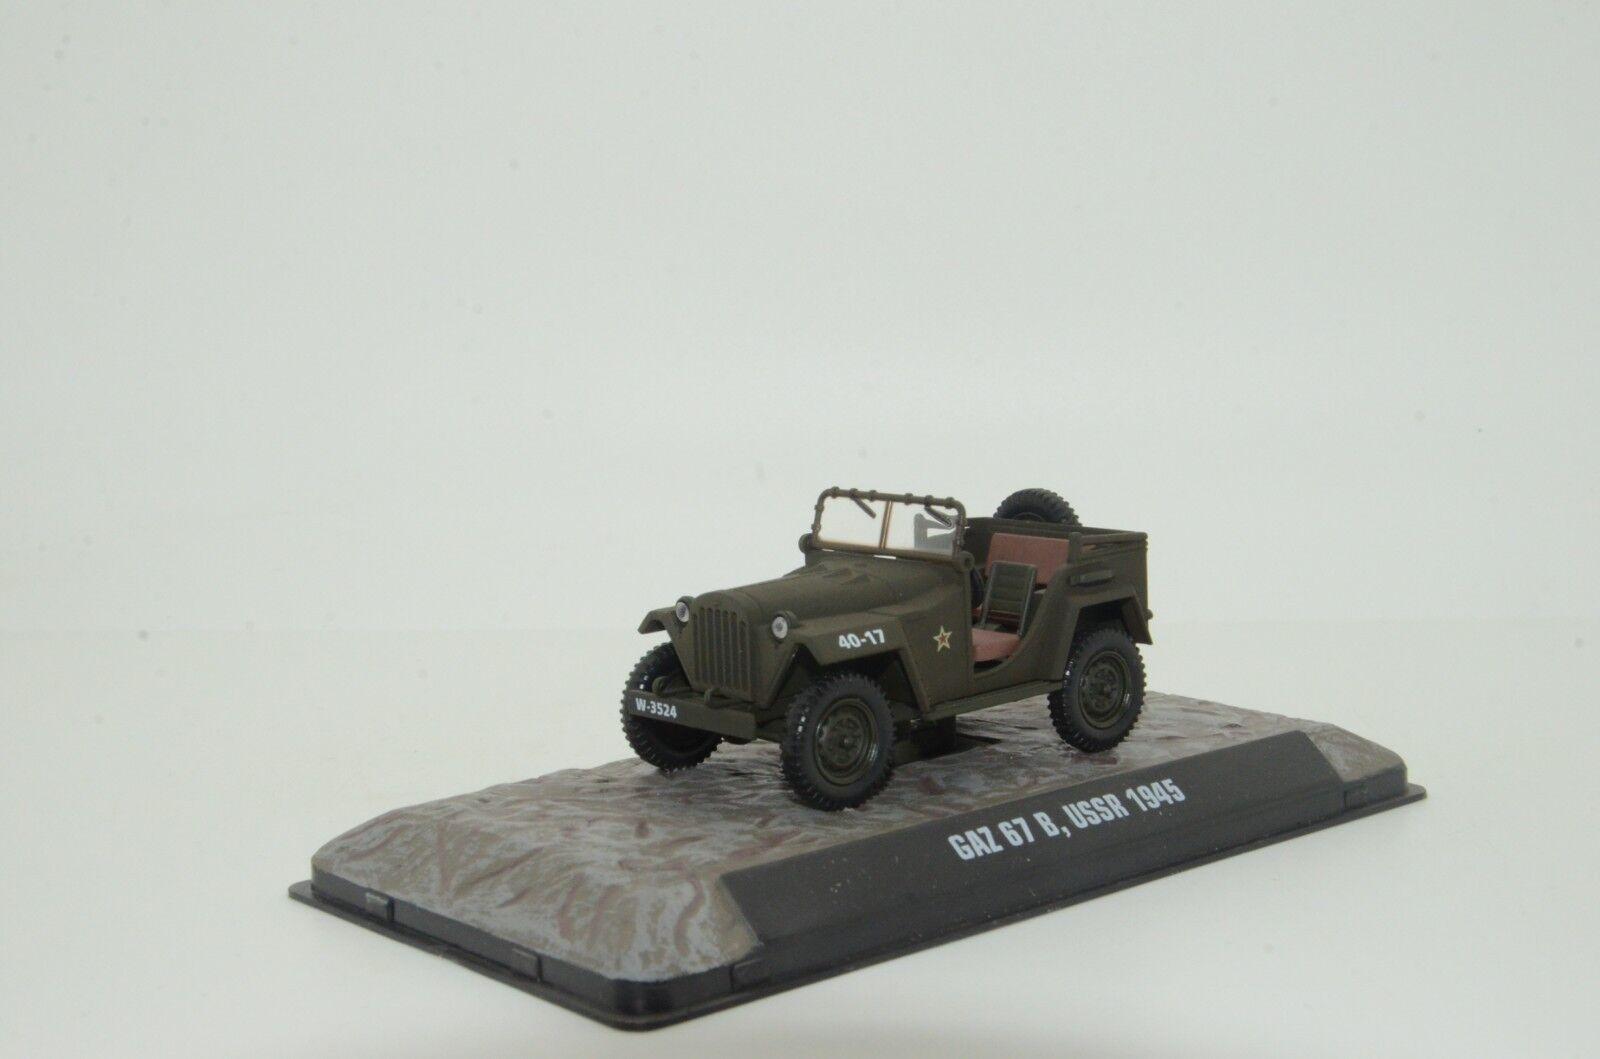 RARE     Gaz 67 B USSR 1945 Army Jeep Atlas 1 43